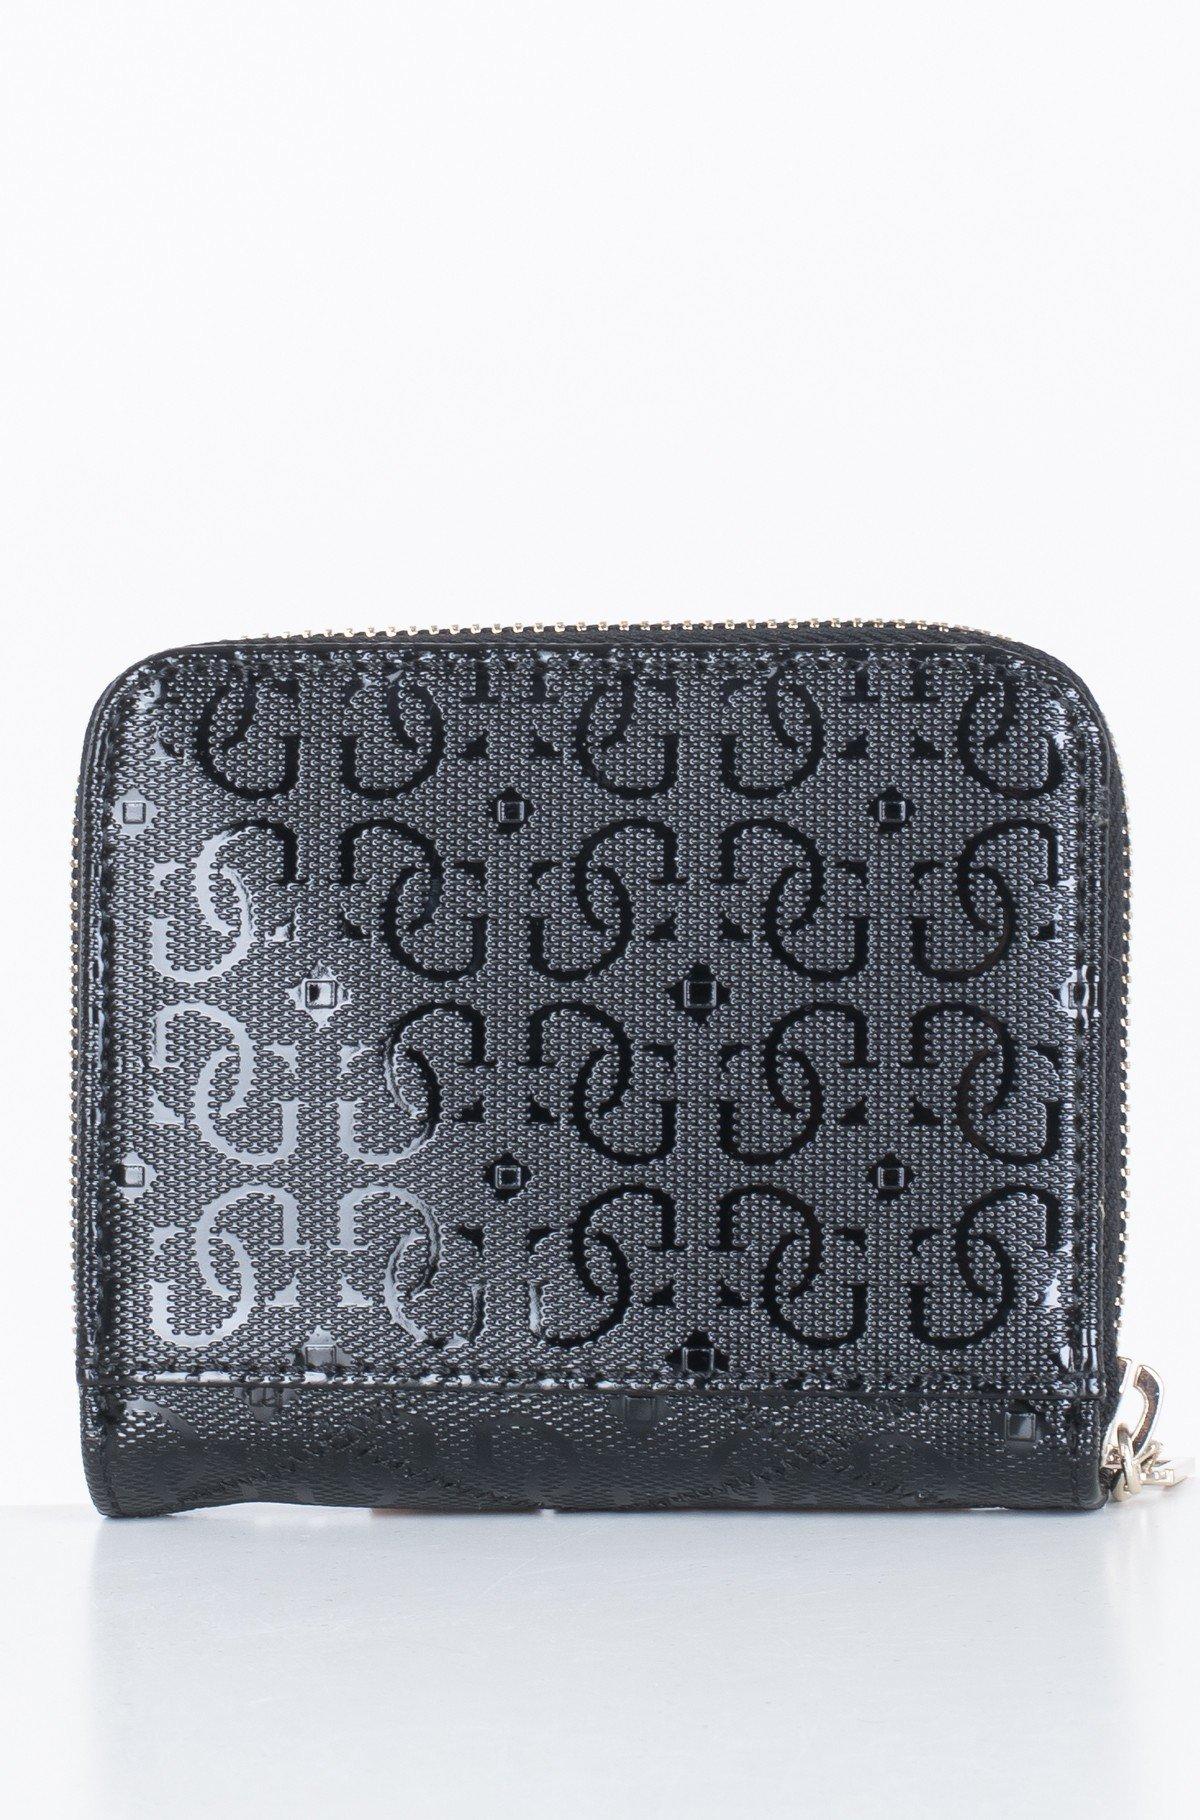 Wallet SWSG74 79370-full-2